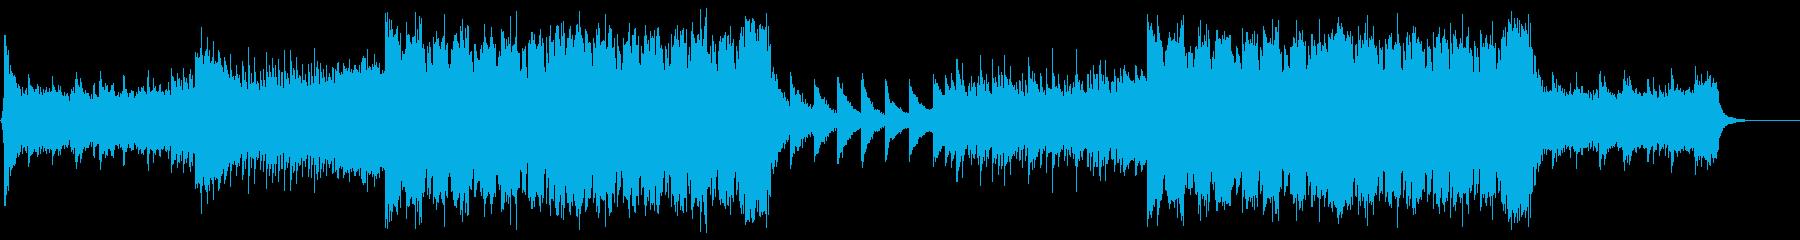 EDM 感動的・ピアノの再生済みの波形